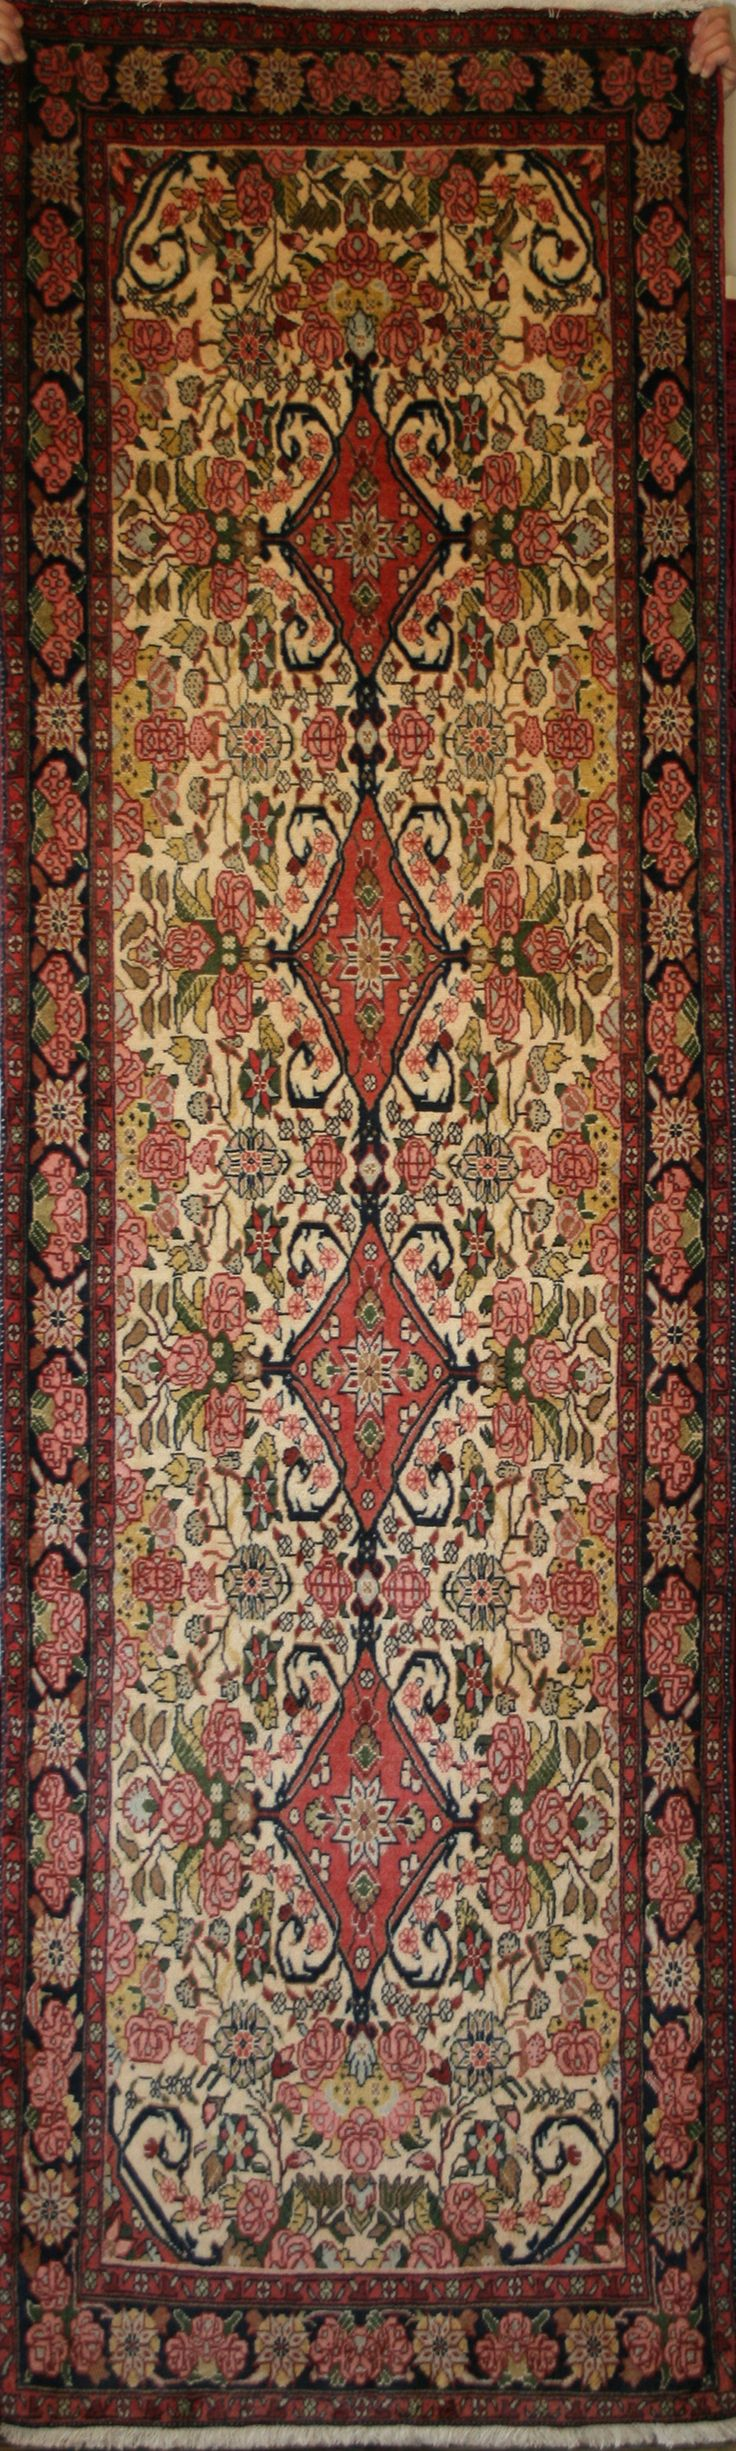 A Hand Knotted Bijar Rug Handmade In Iran